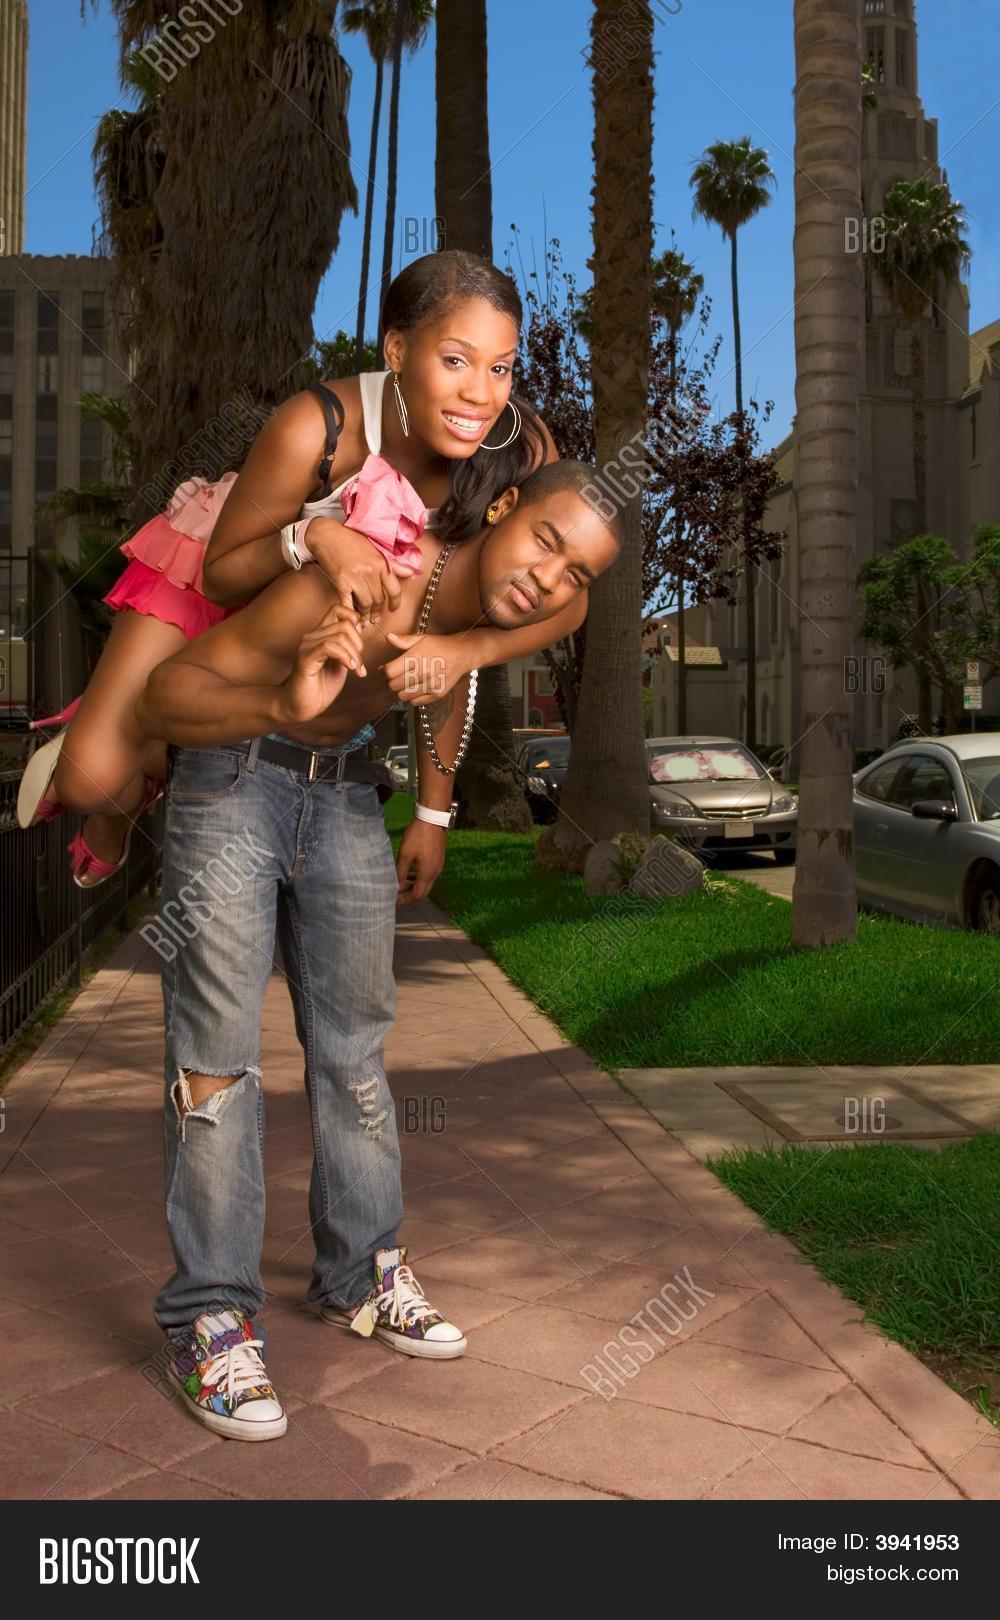 Home made street couples scene 4 6